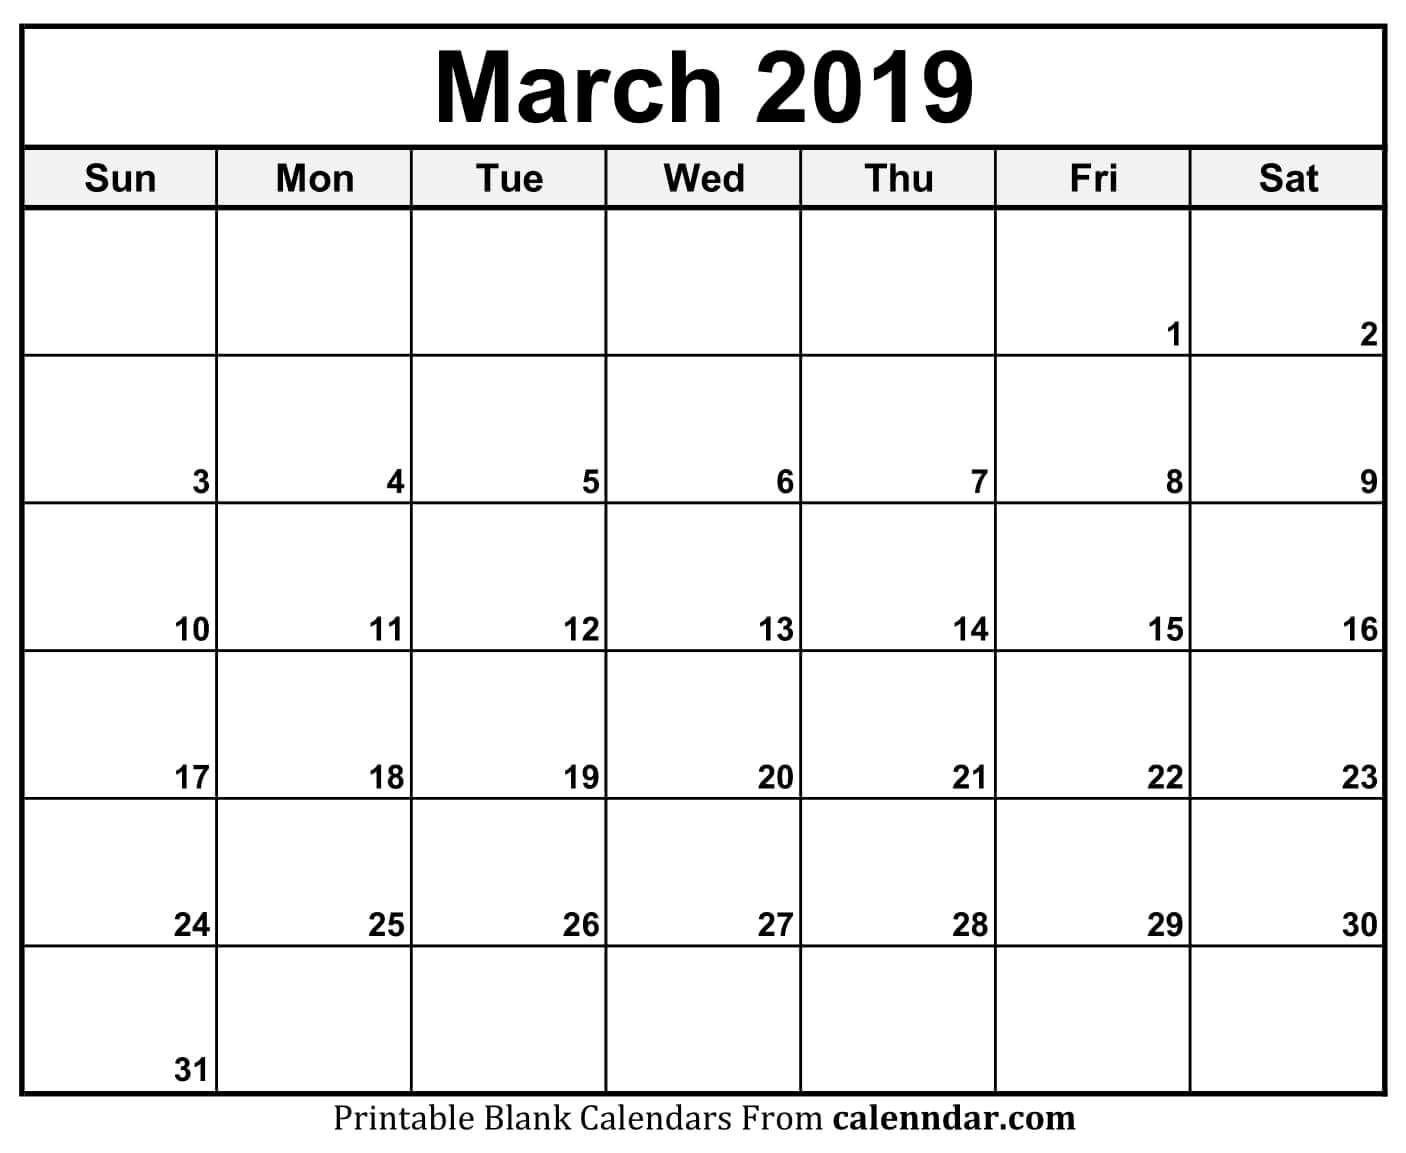 March Calendar 2019 11x17 March March2019calendar March2019 Free June Calendar Printable Calendar Printables Printable Calendar Large